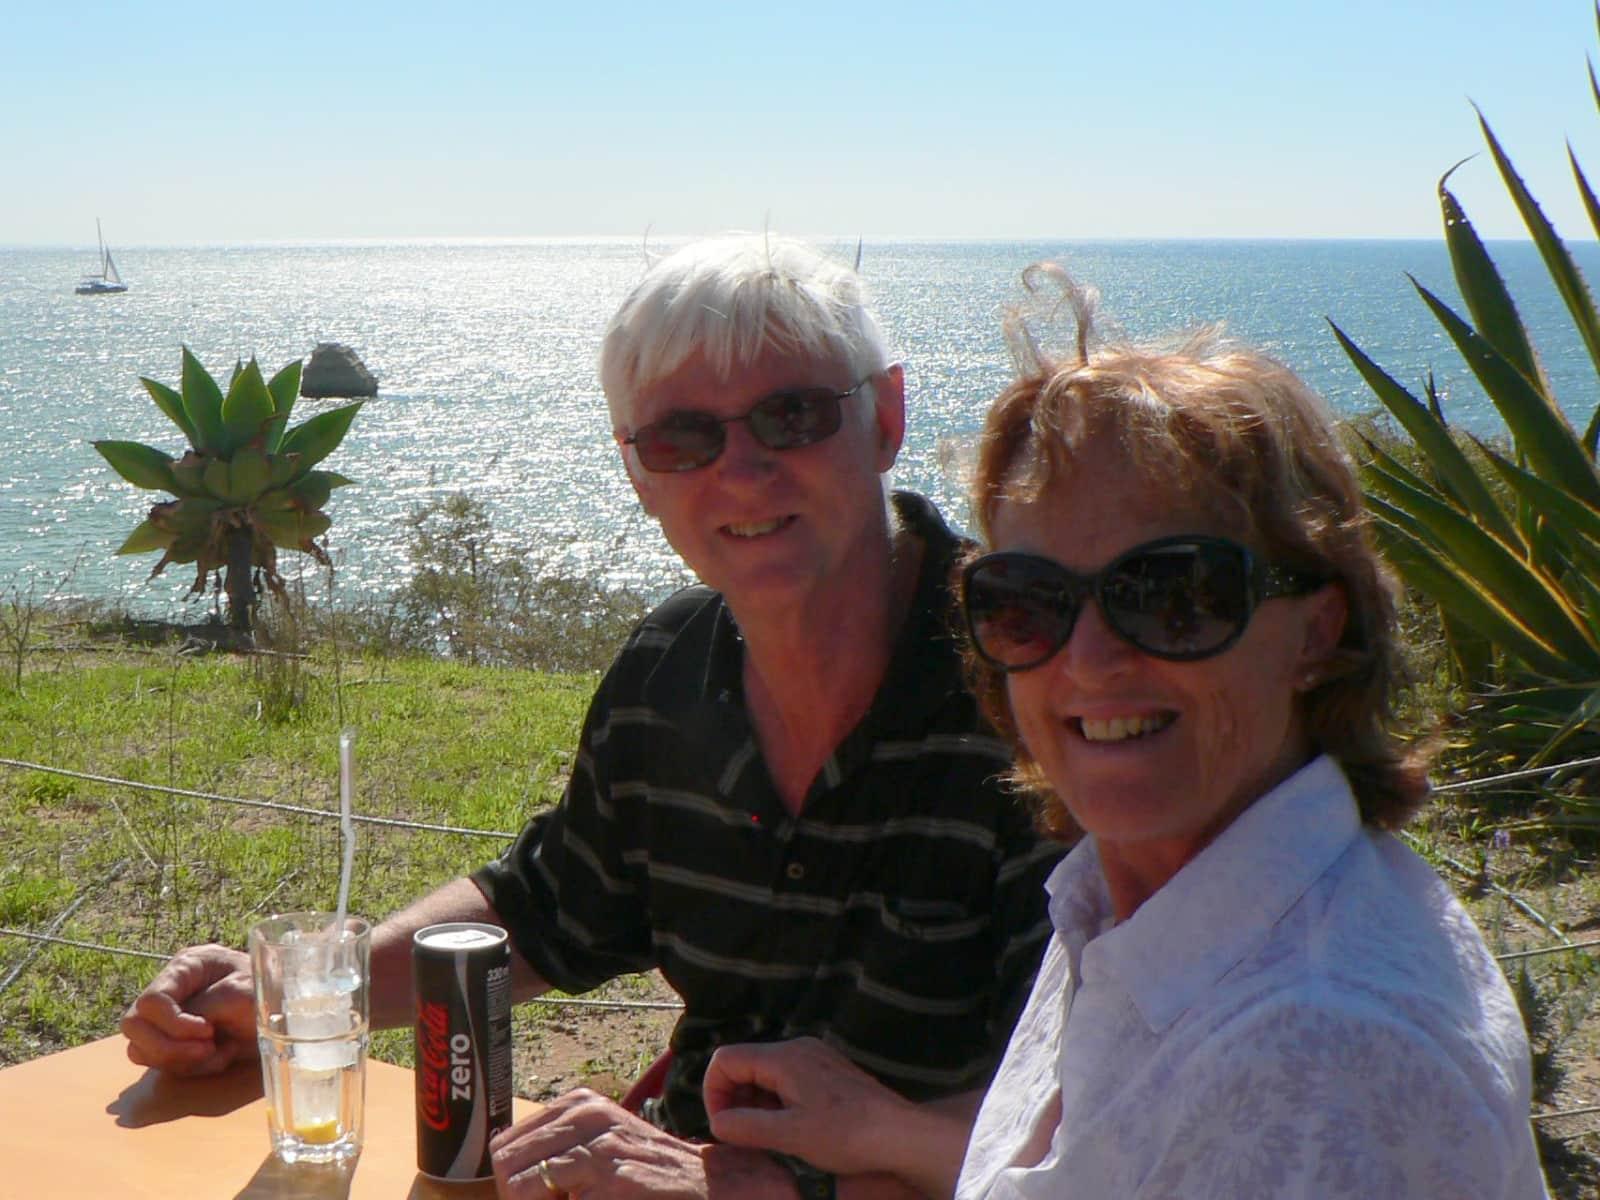 Jennie & Joseph (greg) from Lakes Entrance, Victoria, Australia